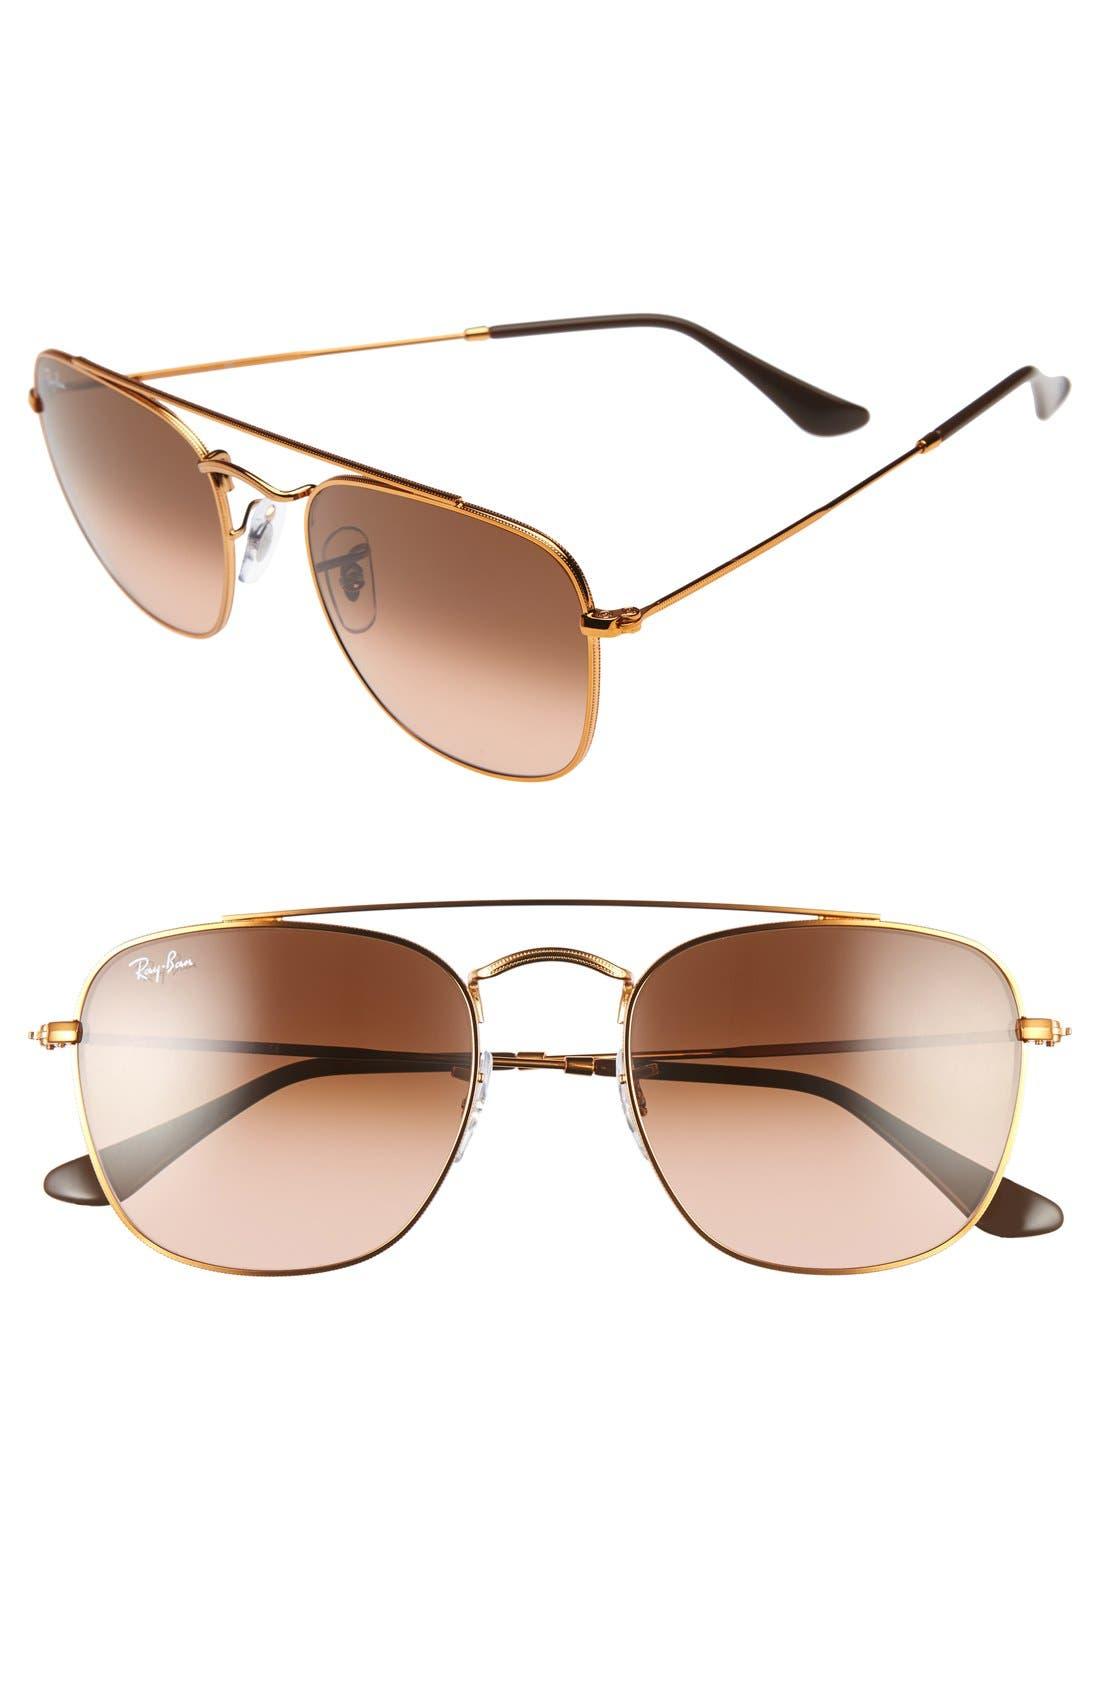 Ray-Ban Icons 54mm Aviator Sunglasses